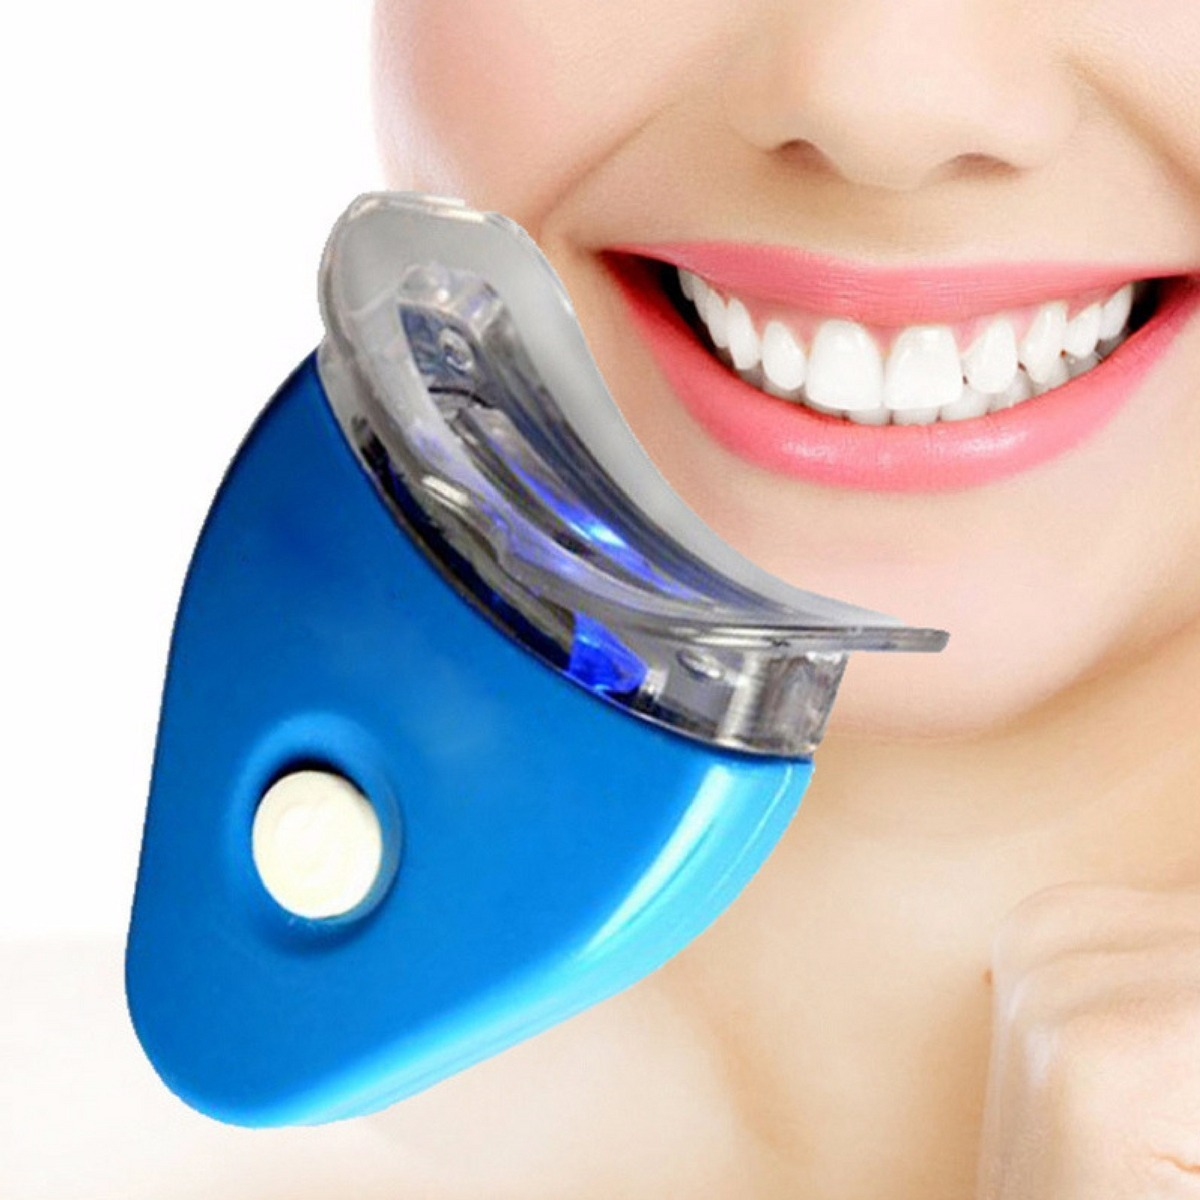 Clareador E Branqueador Dentario White Light Profissional R 35 45